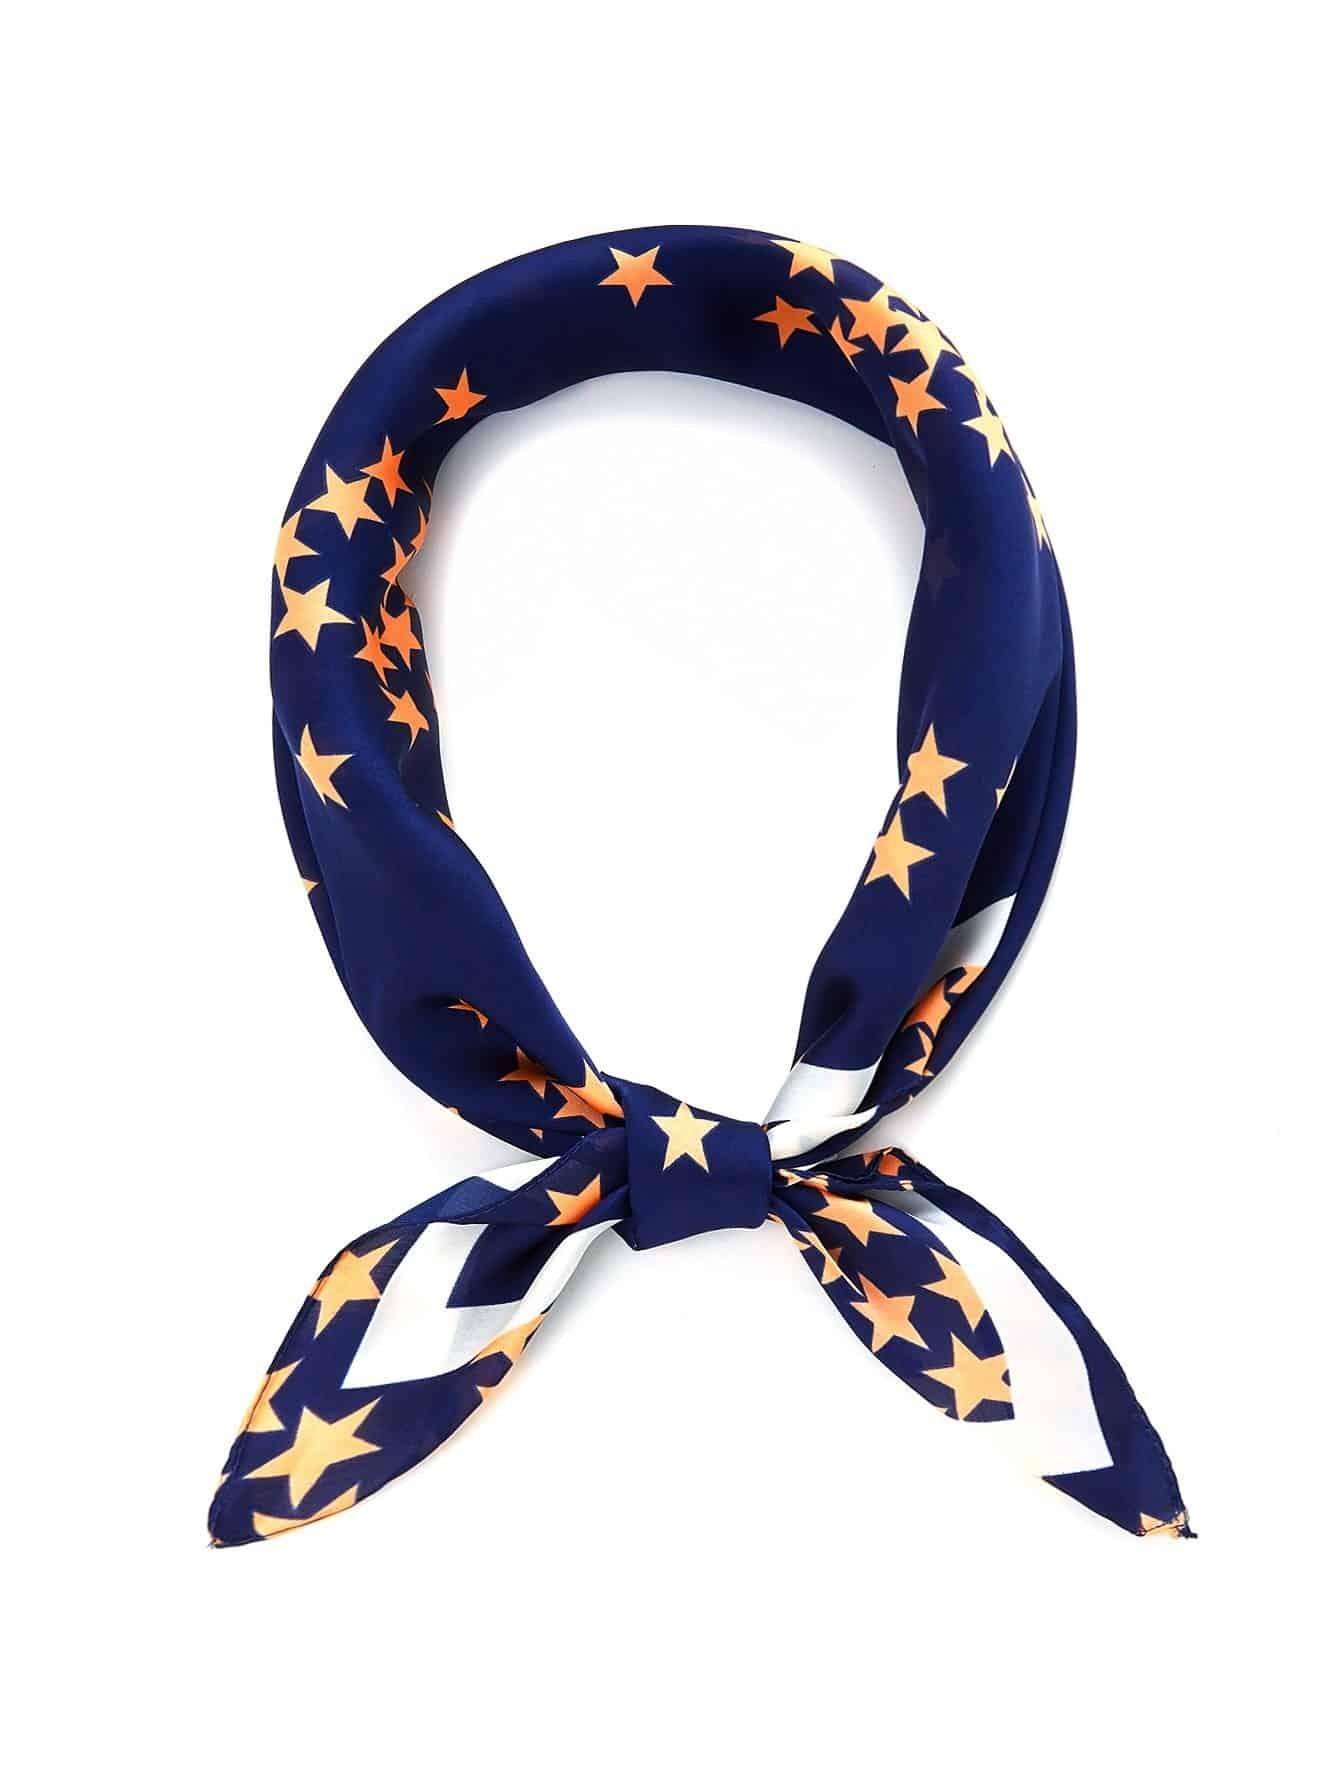 Star Print Bandana Scarf calico print satin bandana